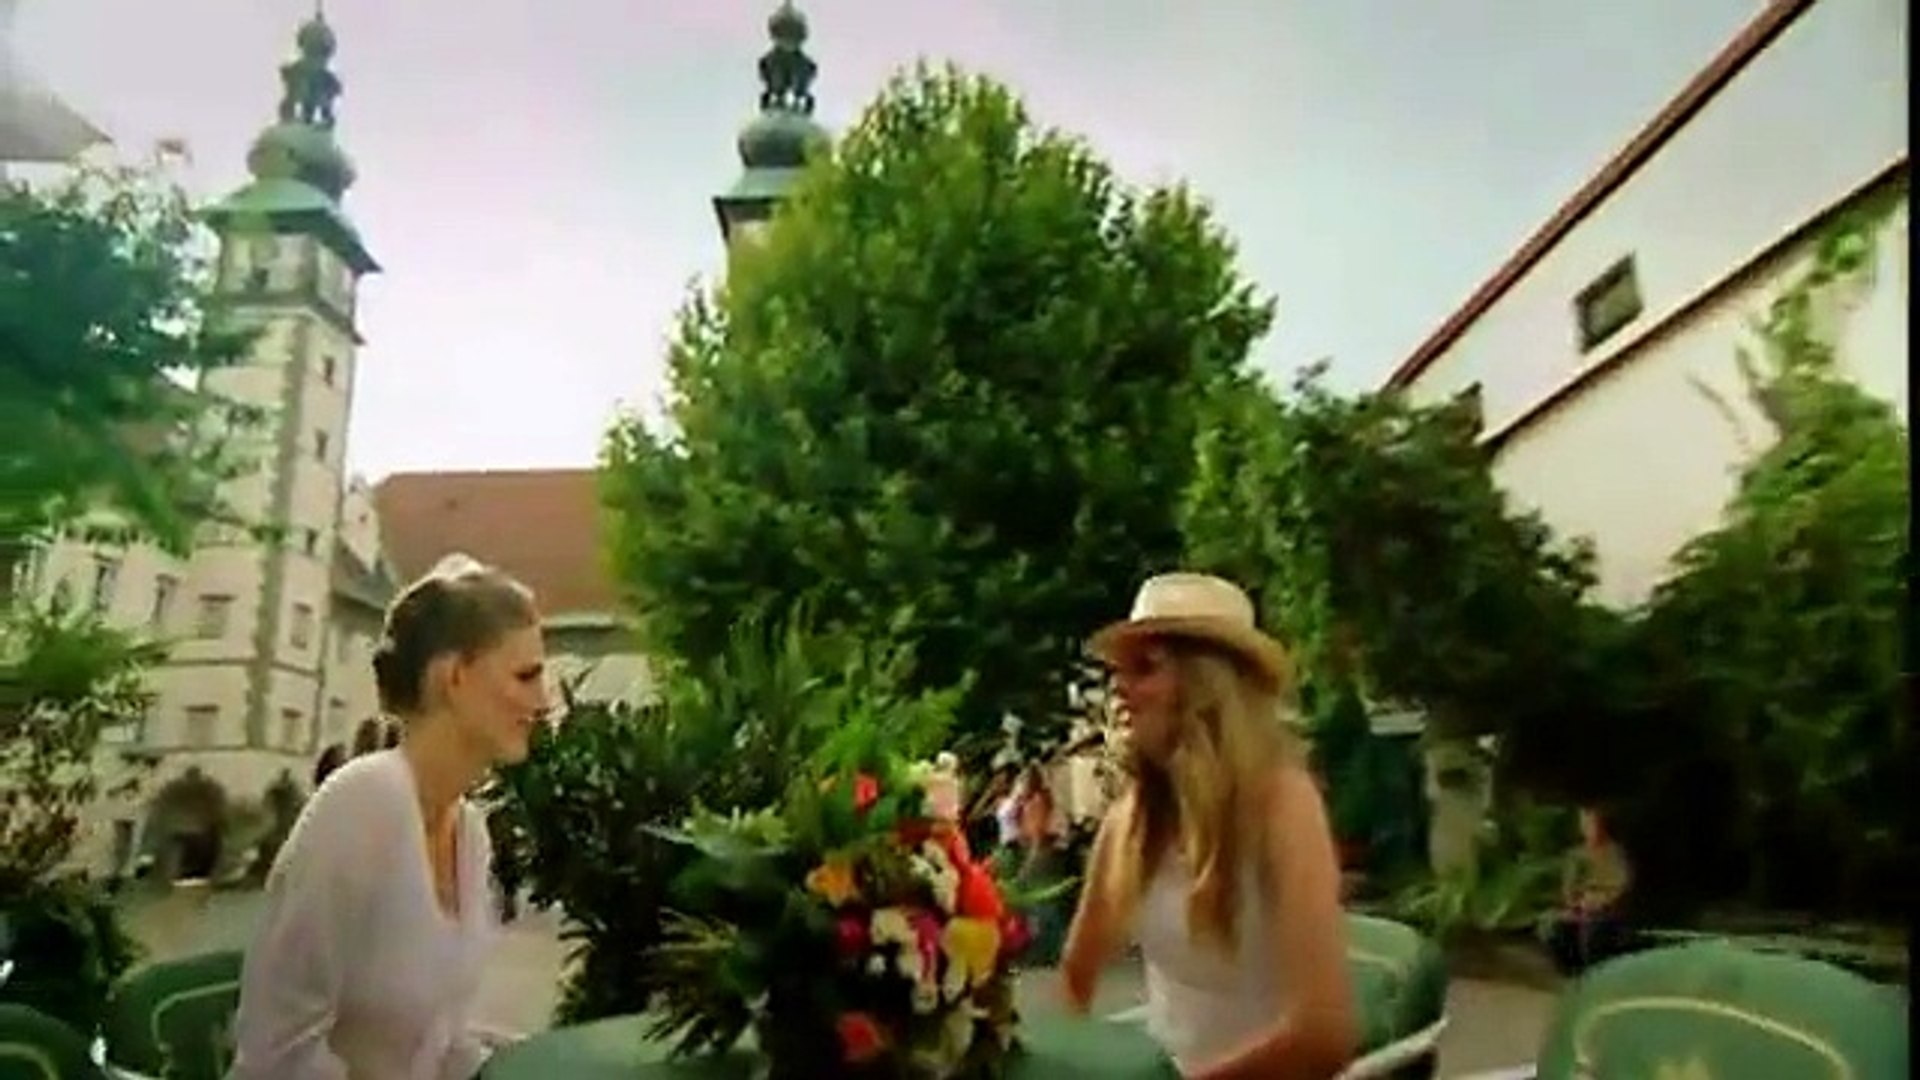 Austria - Discover the Variety of Austria - Summer - L'Austria in Estate